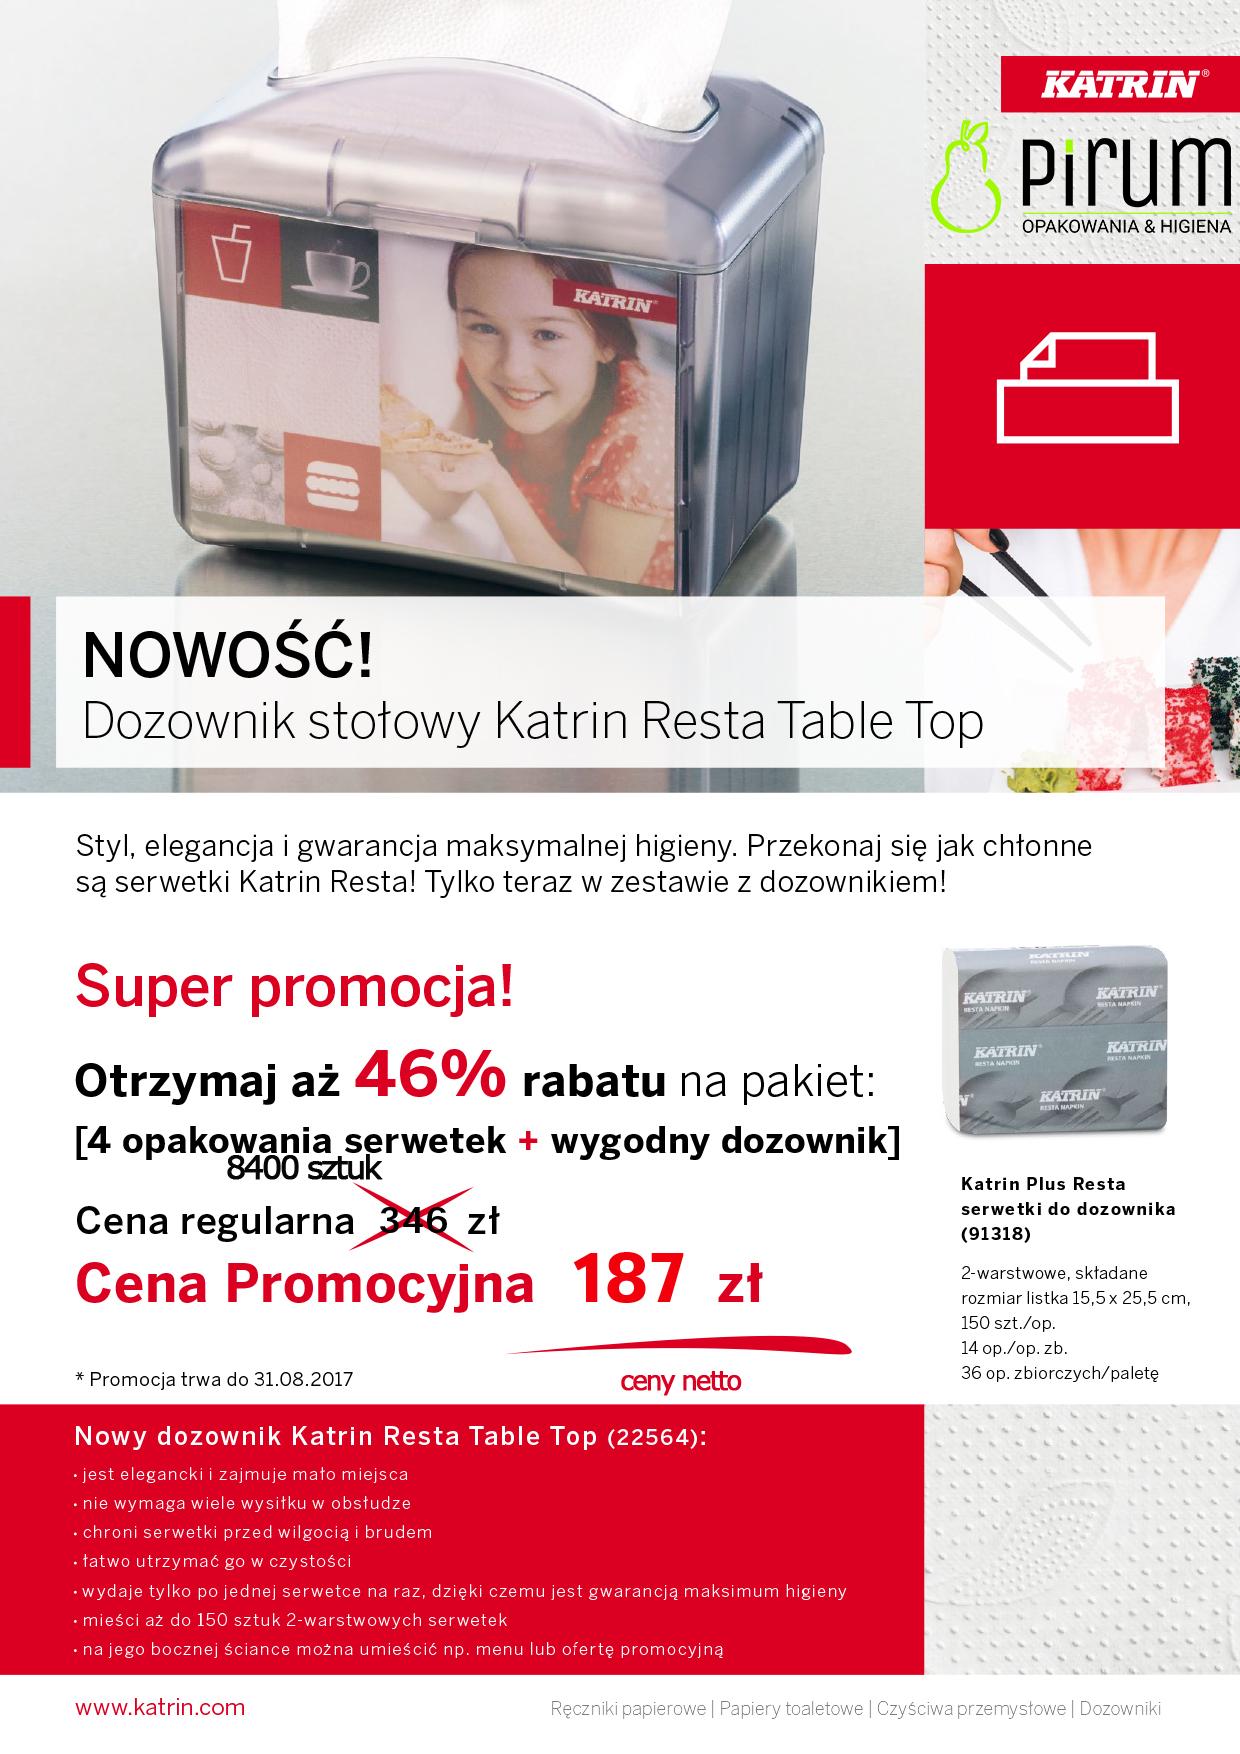 katrin_resta-ulotka_promocyjna-edyt..jpg